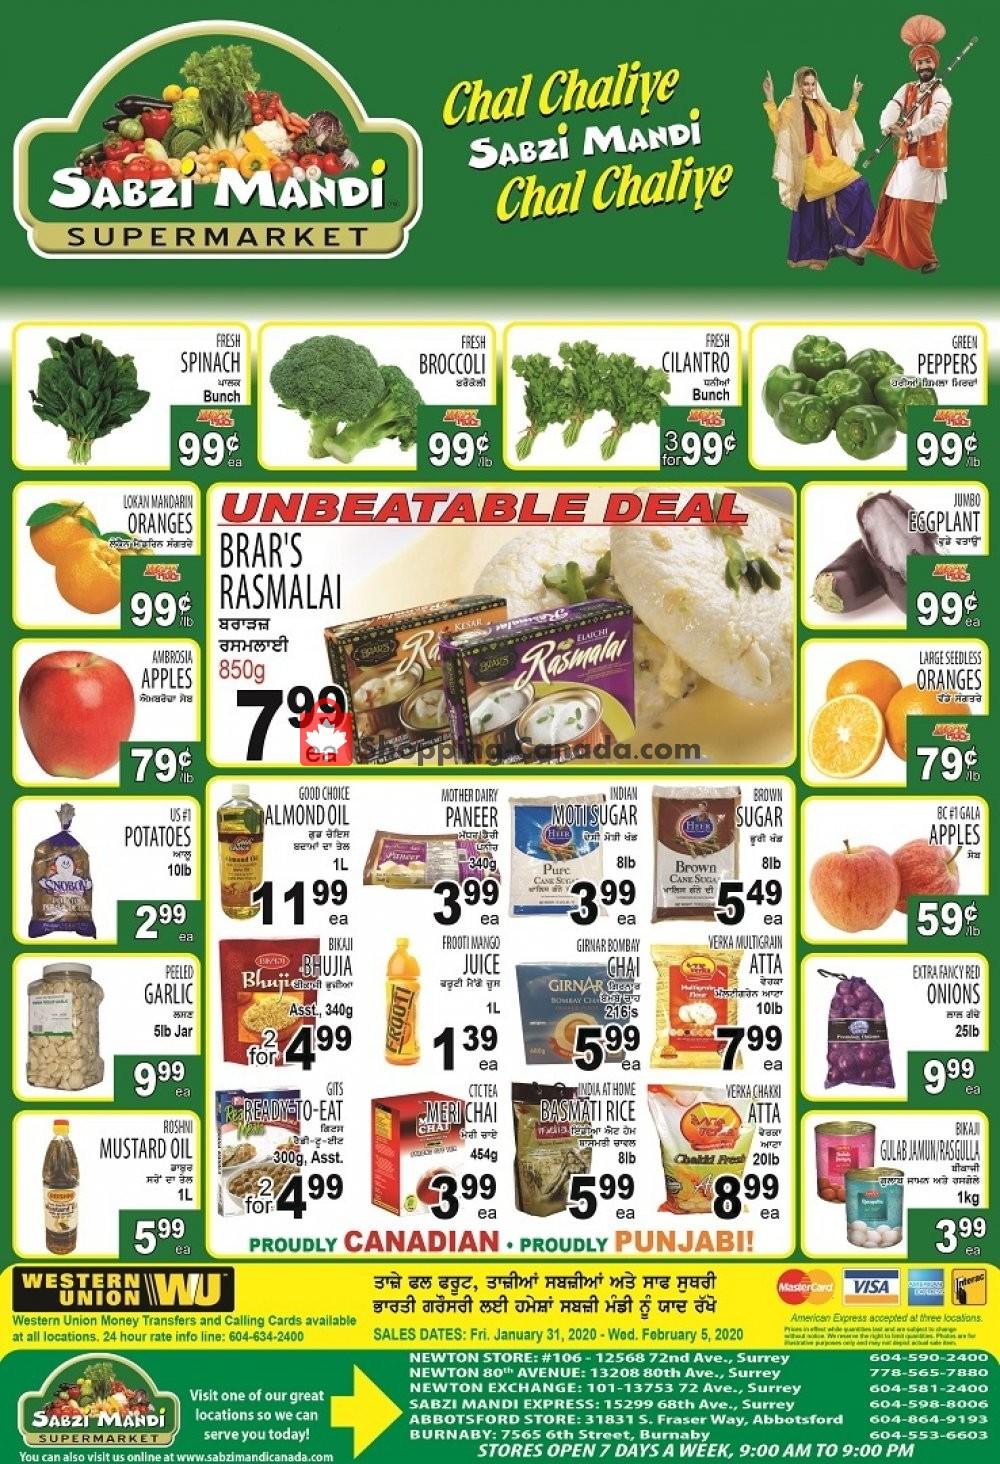 Flyer Sabzi Mandi Supermarket Canada - from Friday January 31, 2020 to Wednesday February 5, 2020